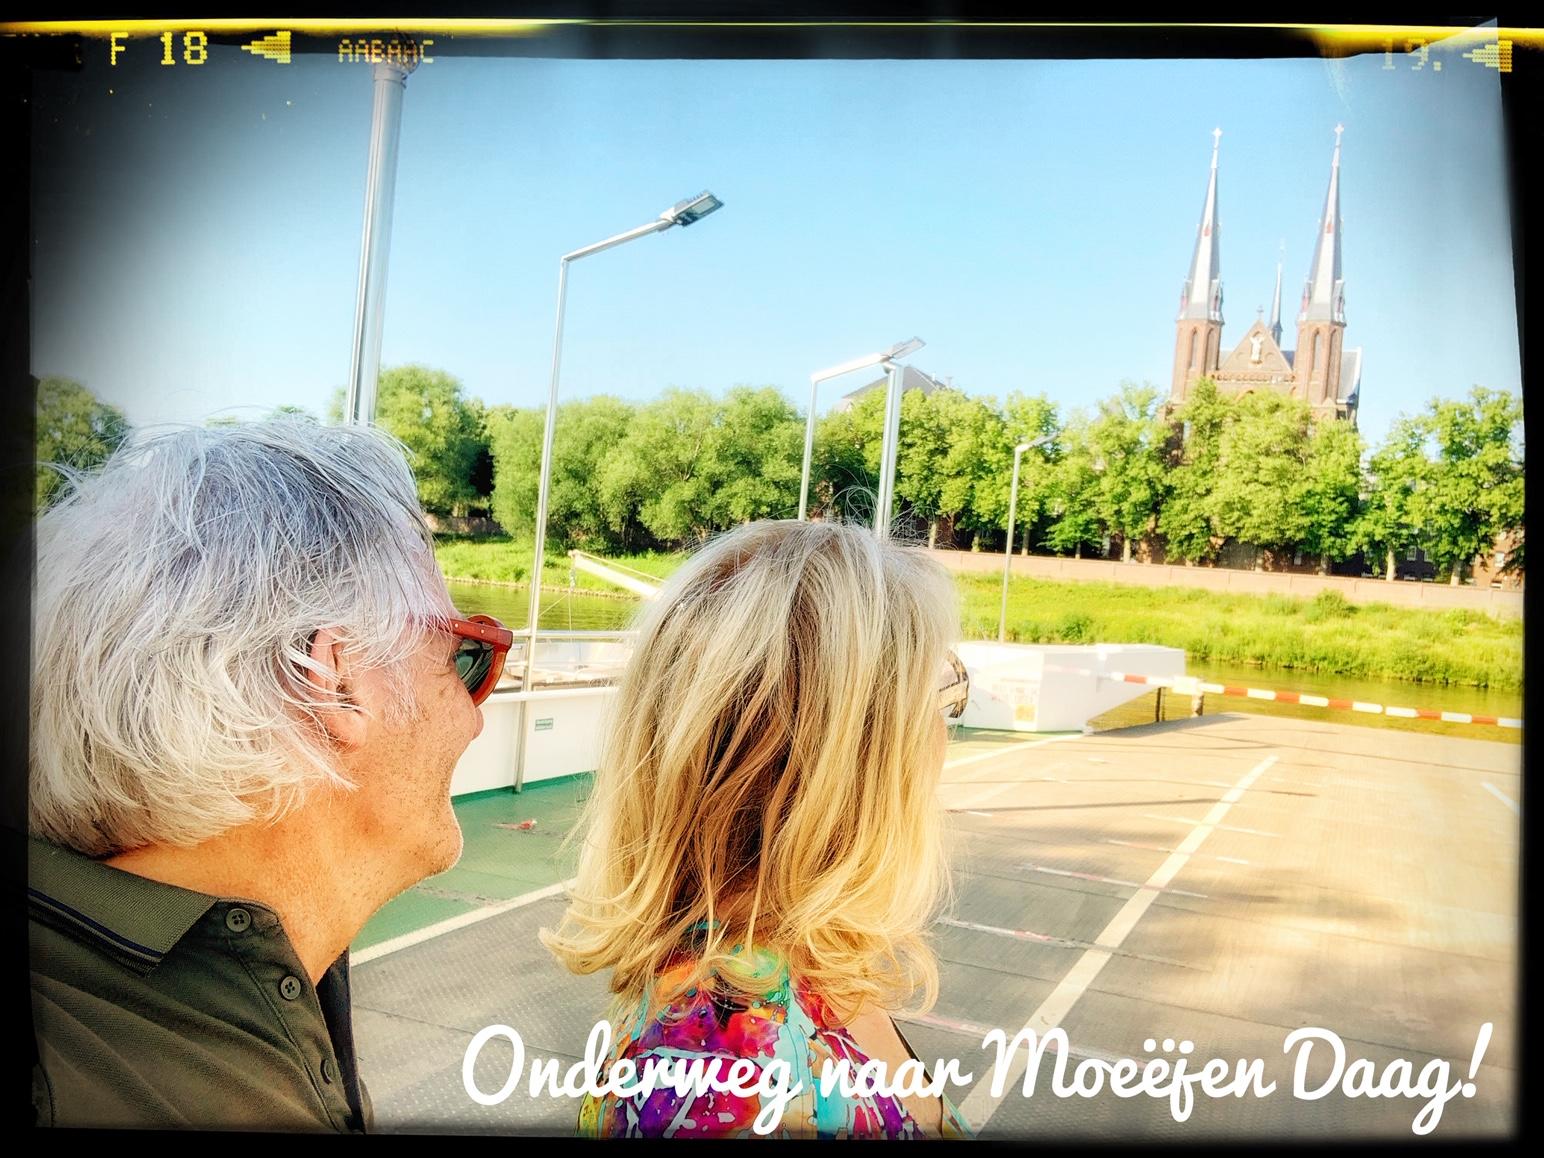 Sjaak en Lianne onderweg naar Moeëjen Daag